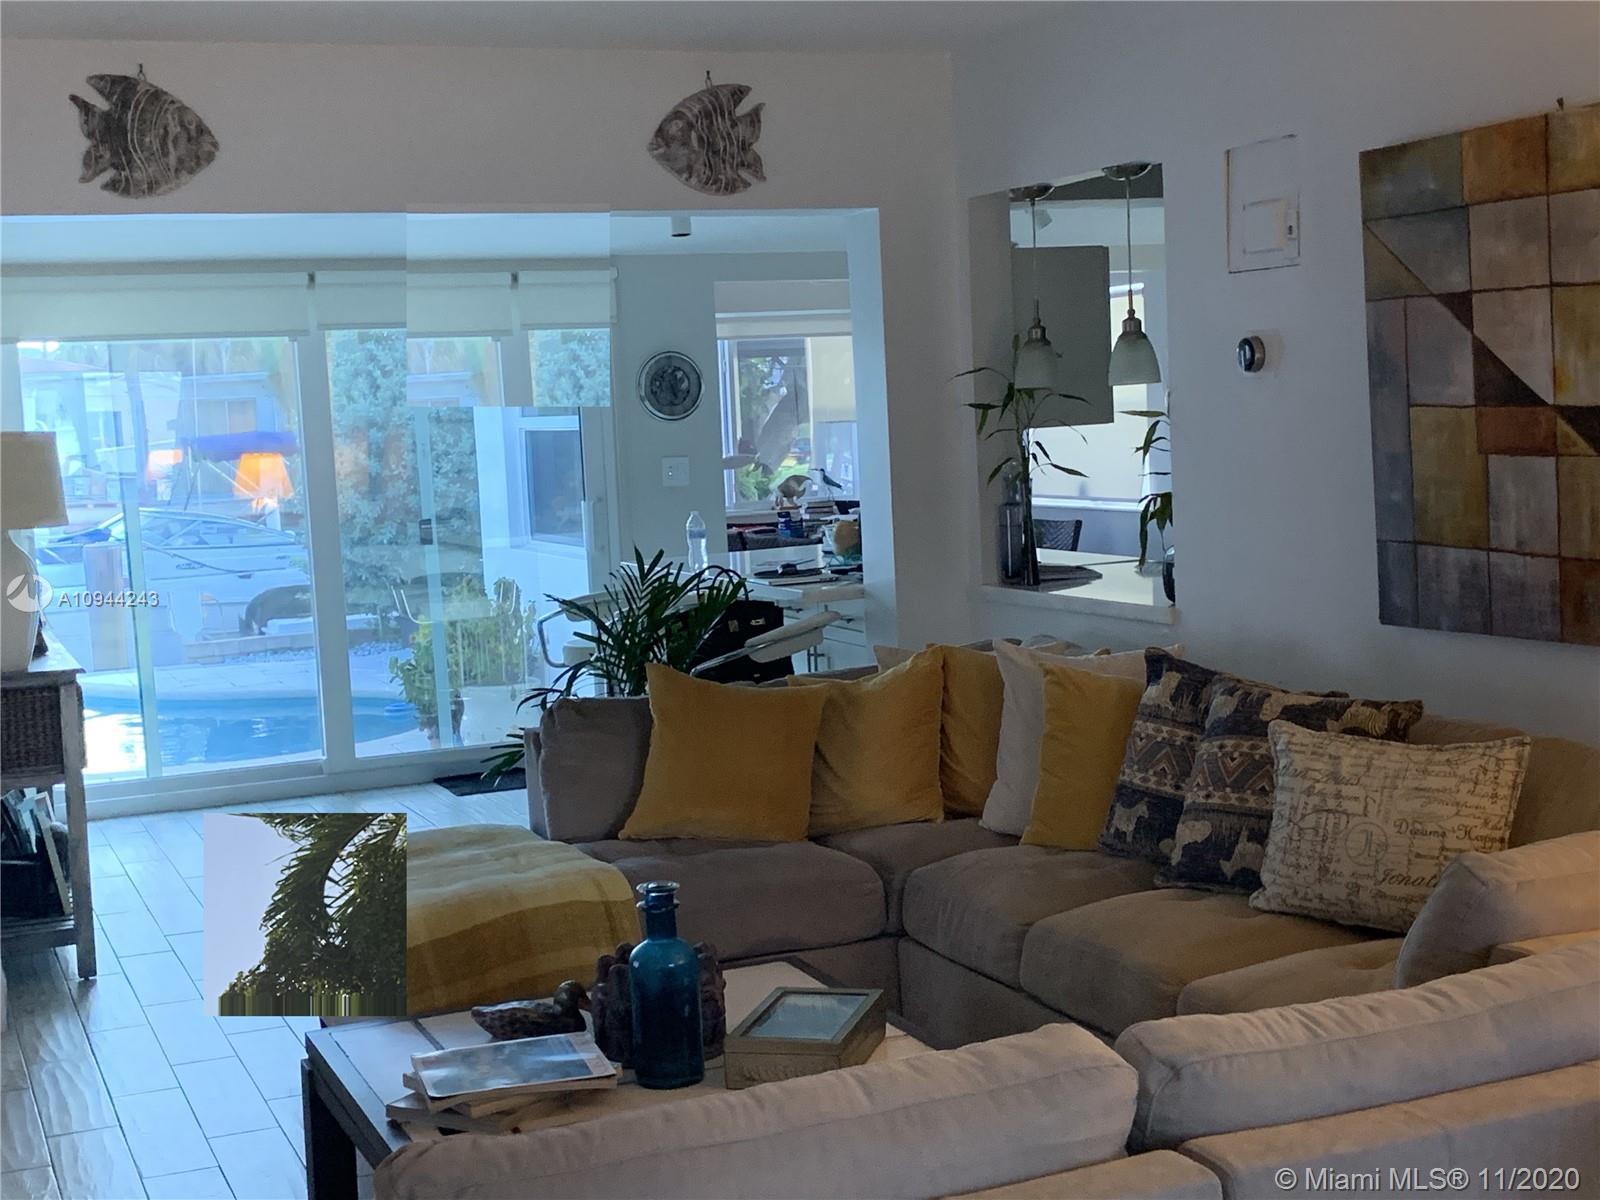 1300 Mango Isle, Fort Lauderdale, Florida 33315, 3 Bedrooms Bedrooms, ,2 BathroomsBathrooms,Residential,For Sale,1300 Mango Isle,A10944243